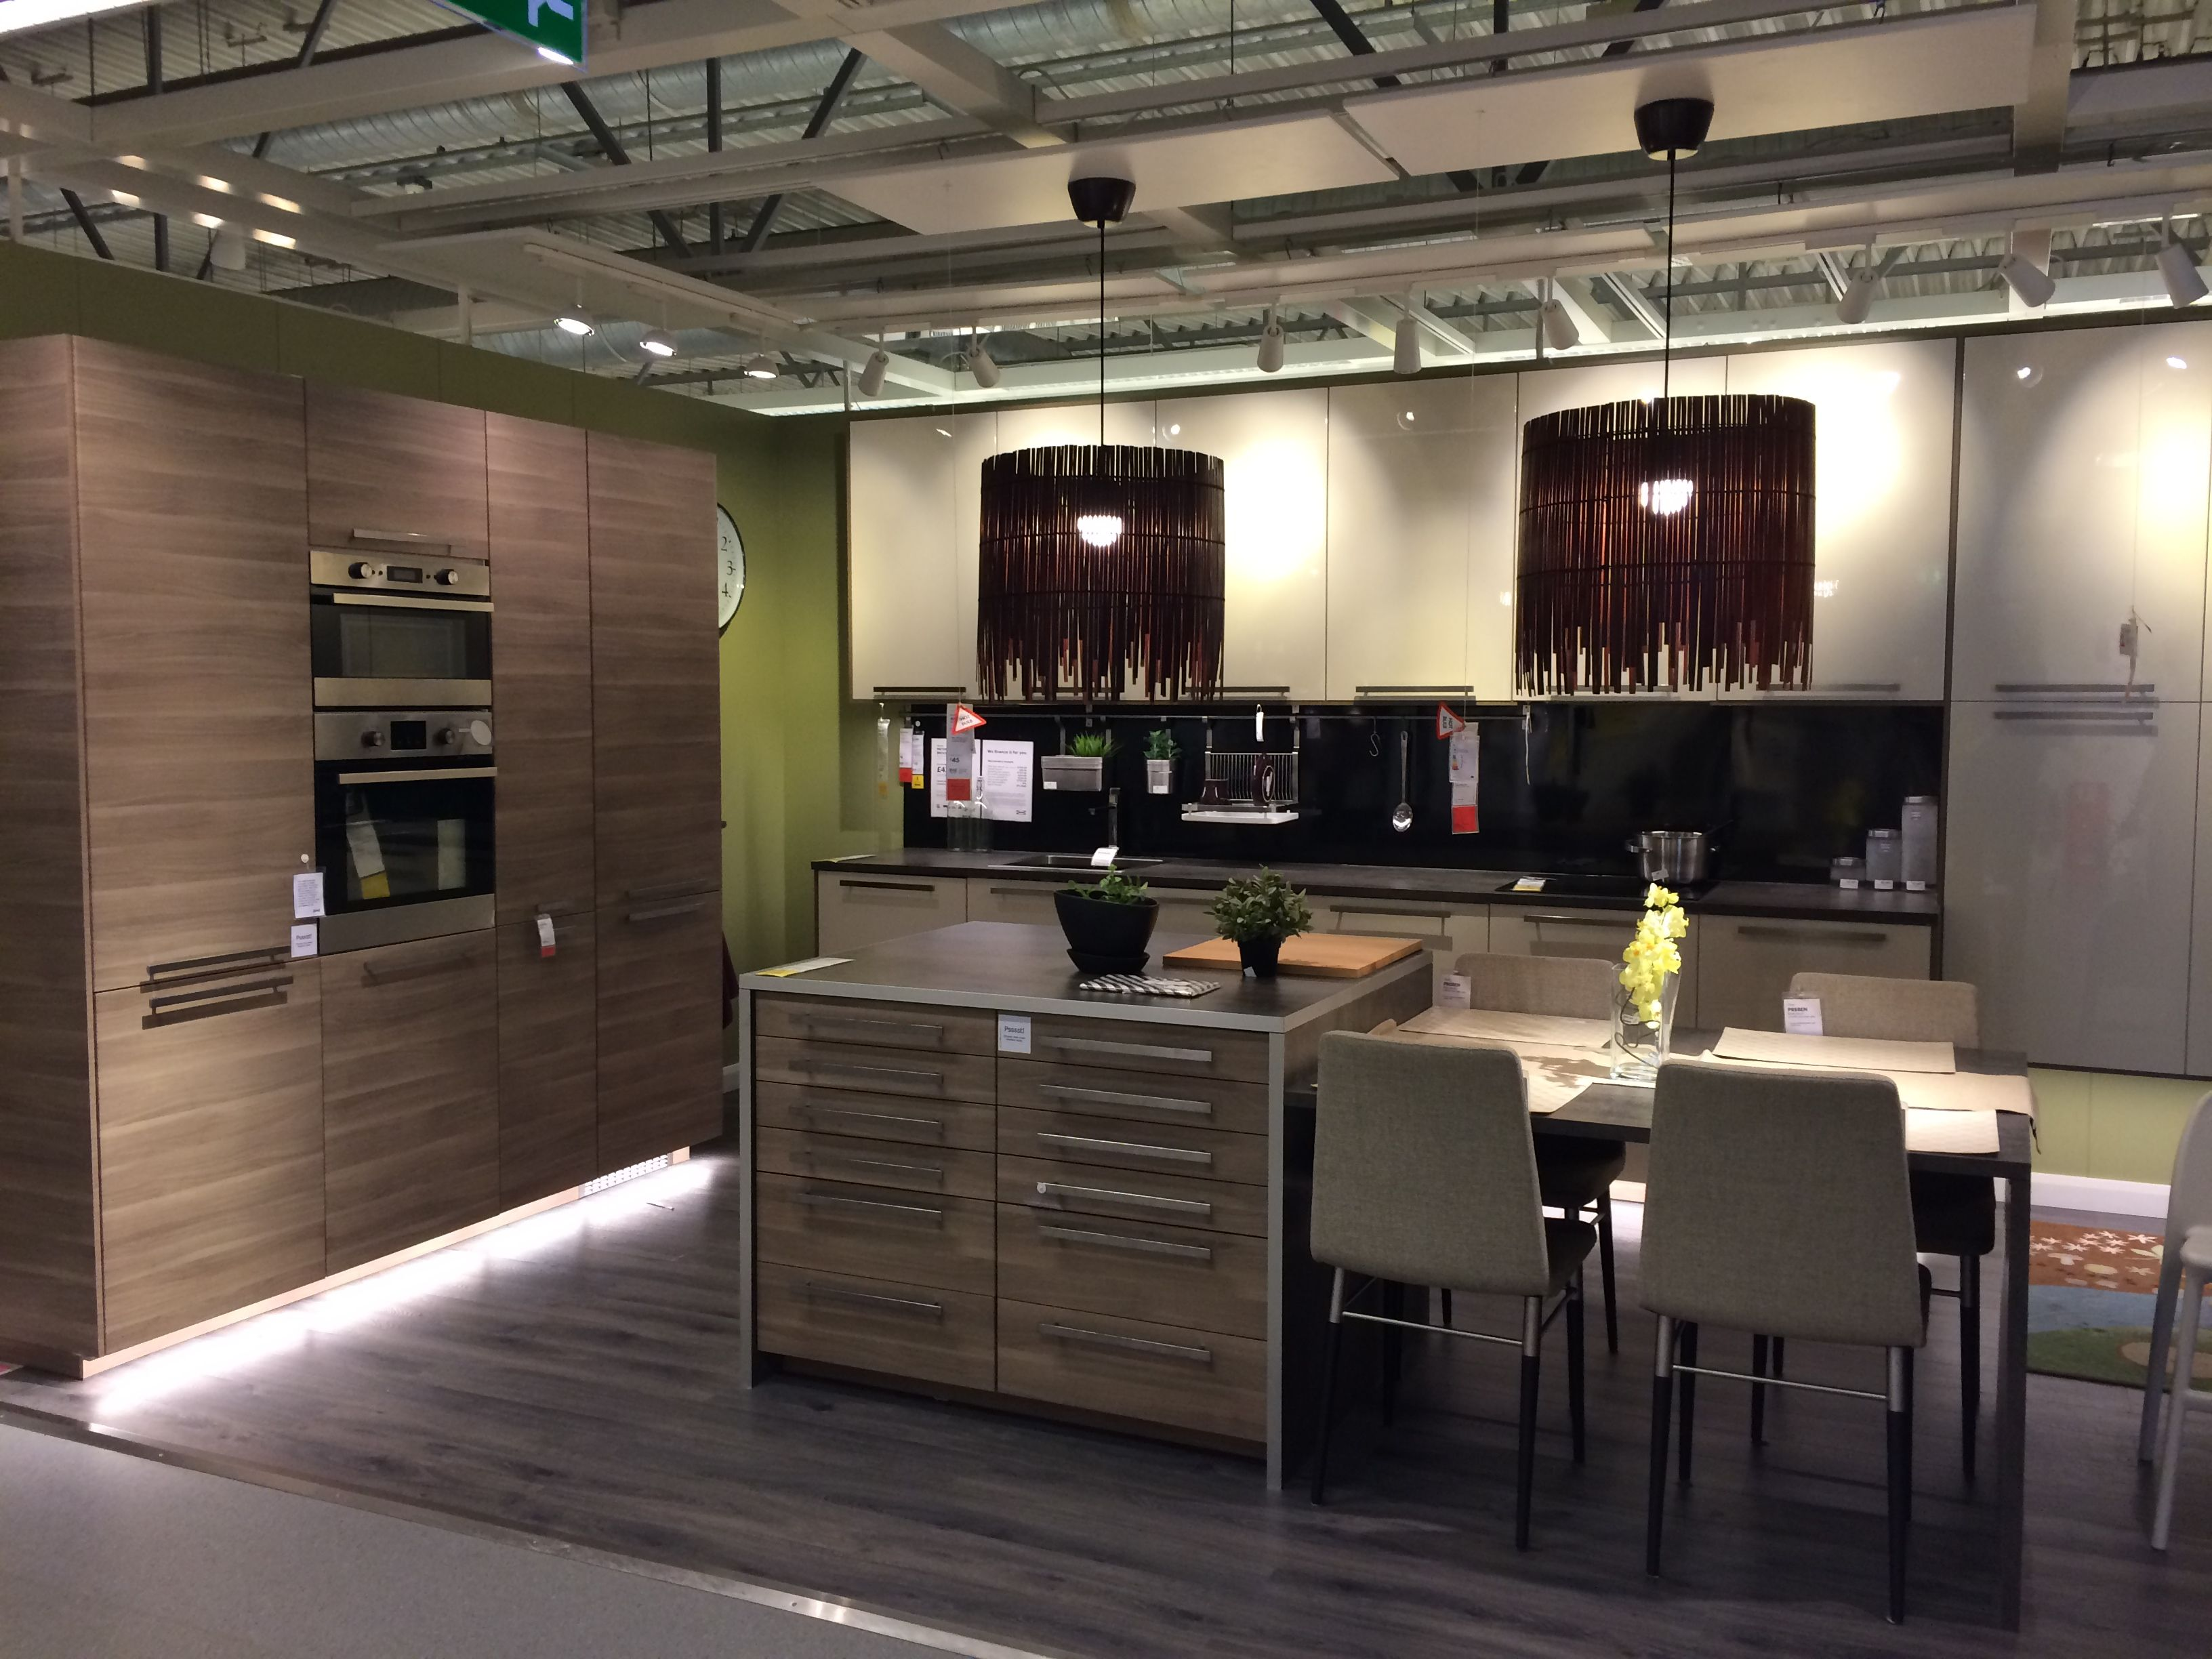 Ikea Kitchen With Great Drawer Idea For The Island. Ikea Showroom, Croydon